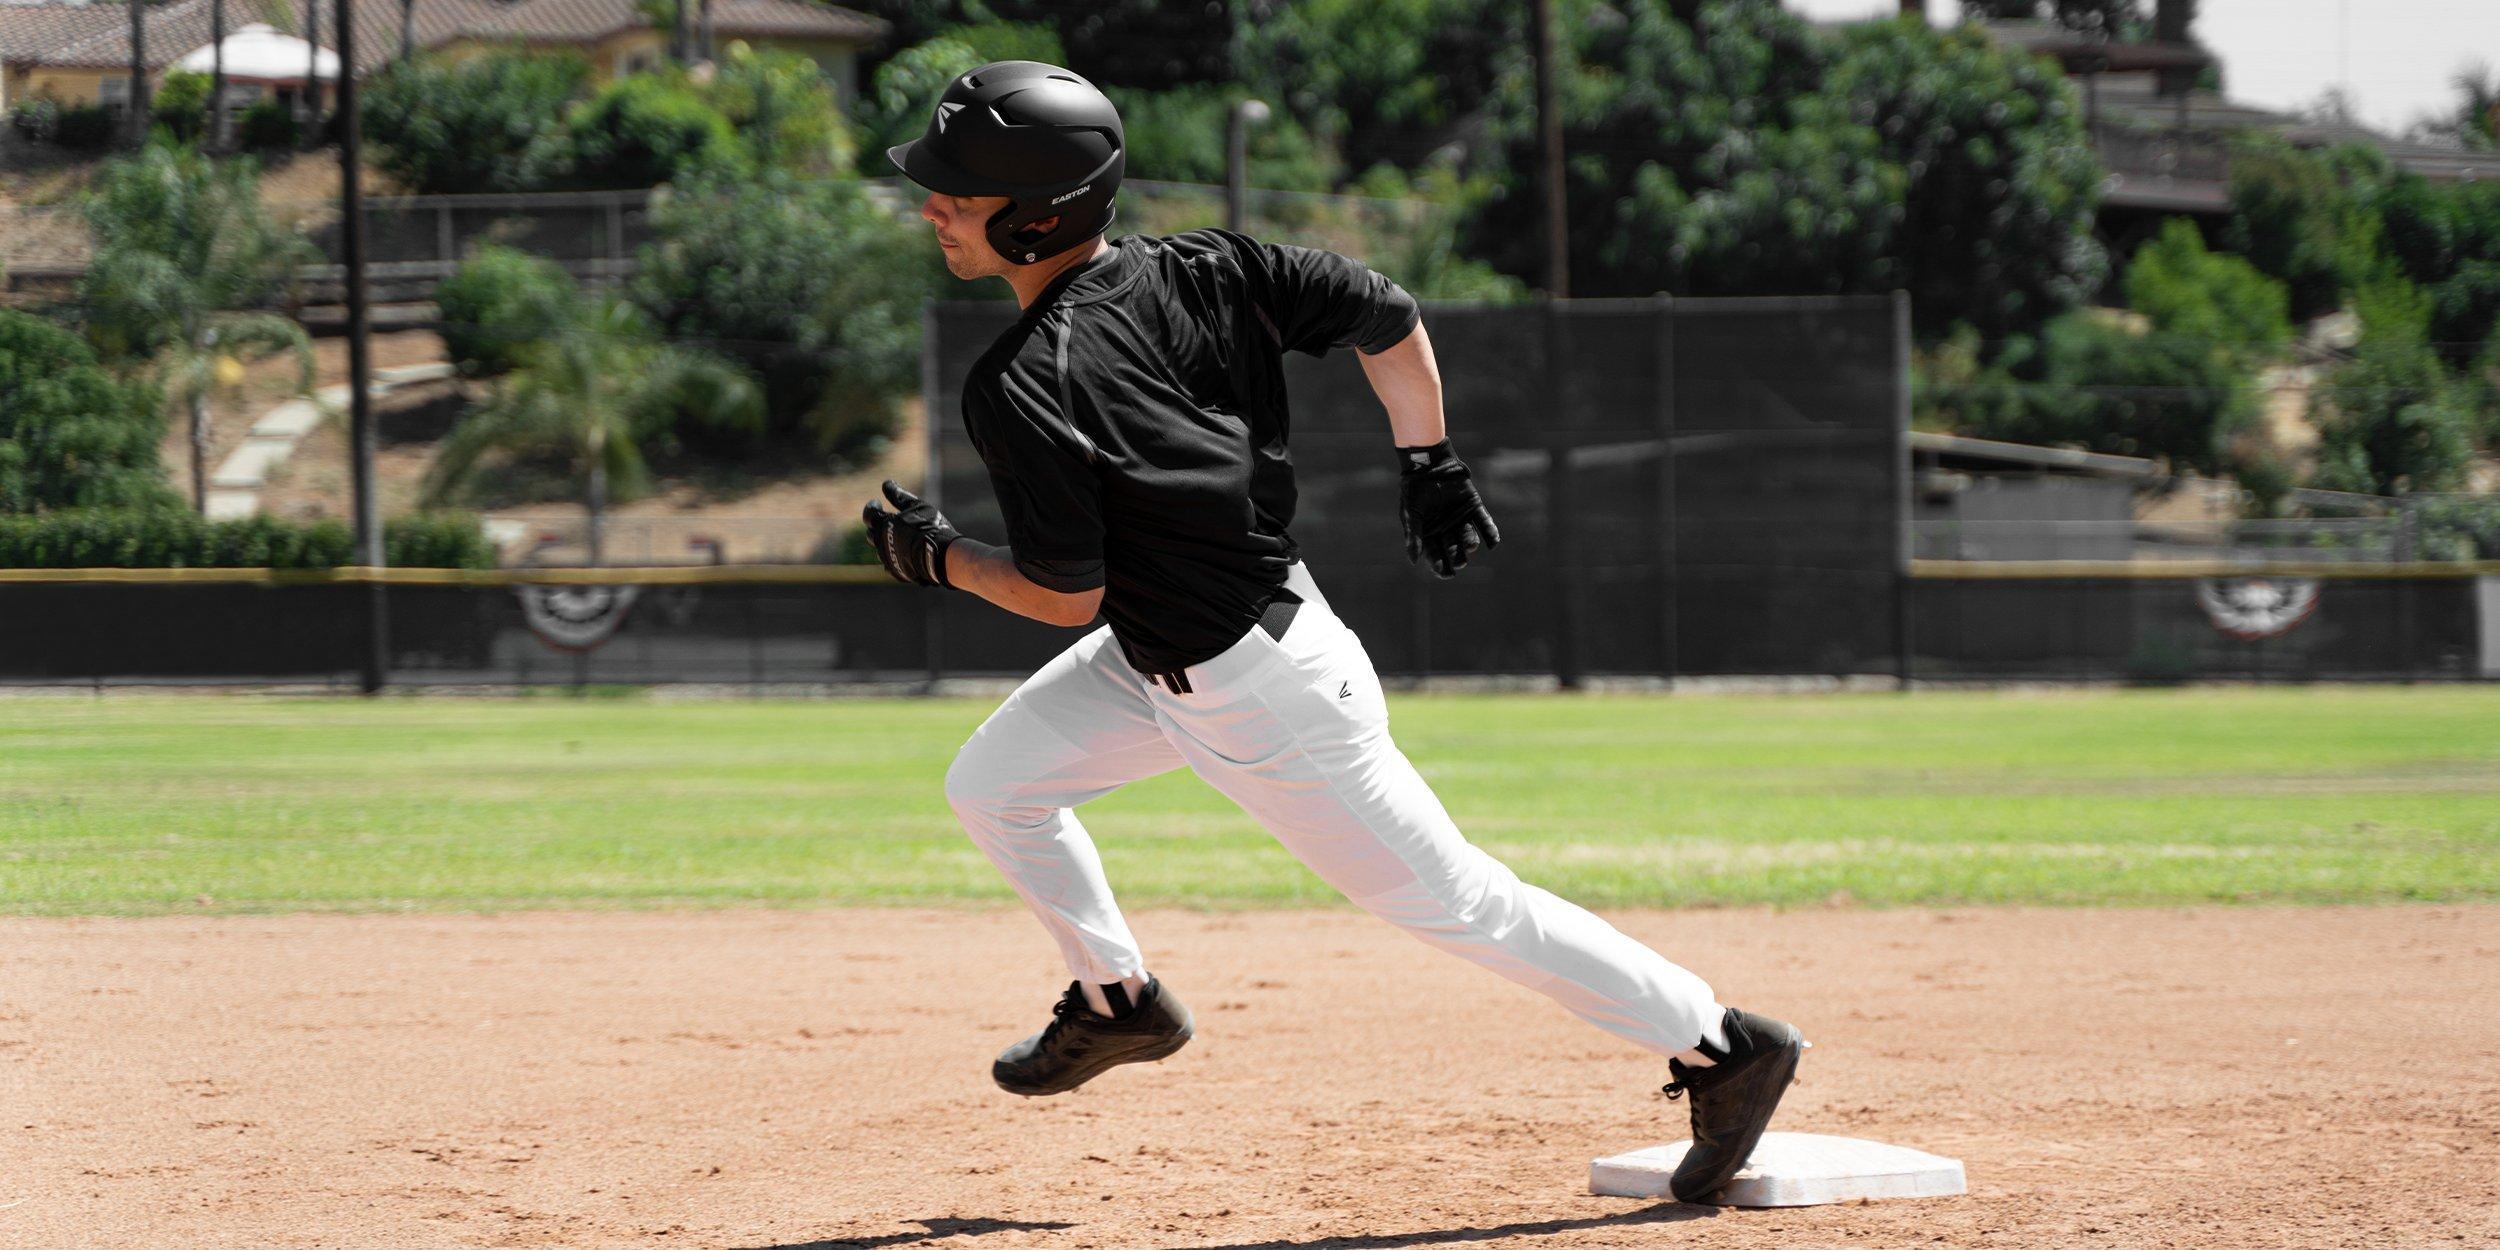 Piped Baseball Pant 2021 Solid EASTON RIVAL+ Knicker Baseball Pant Adult